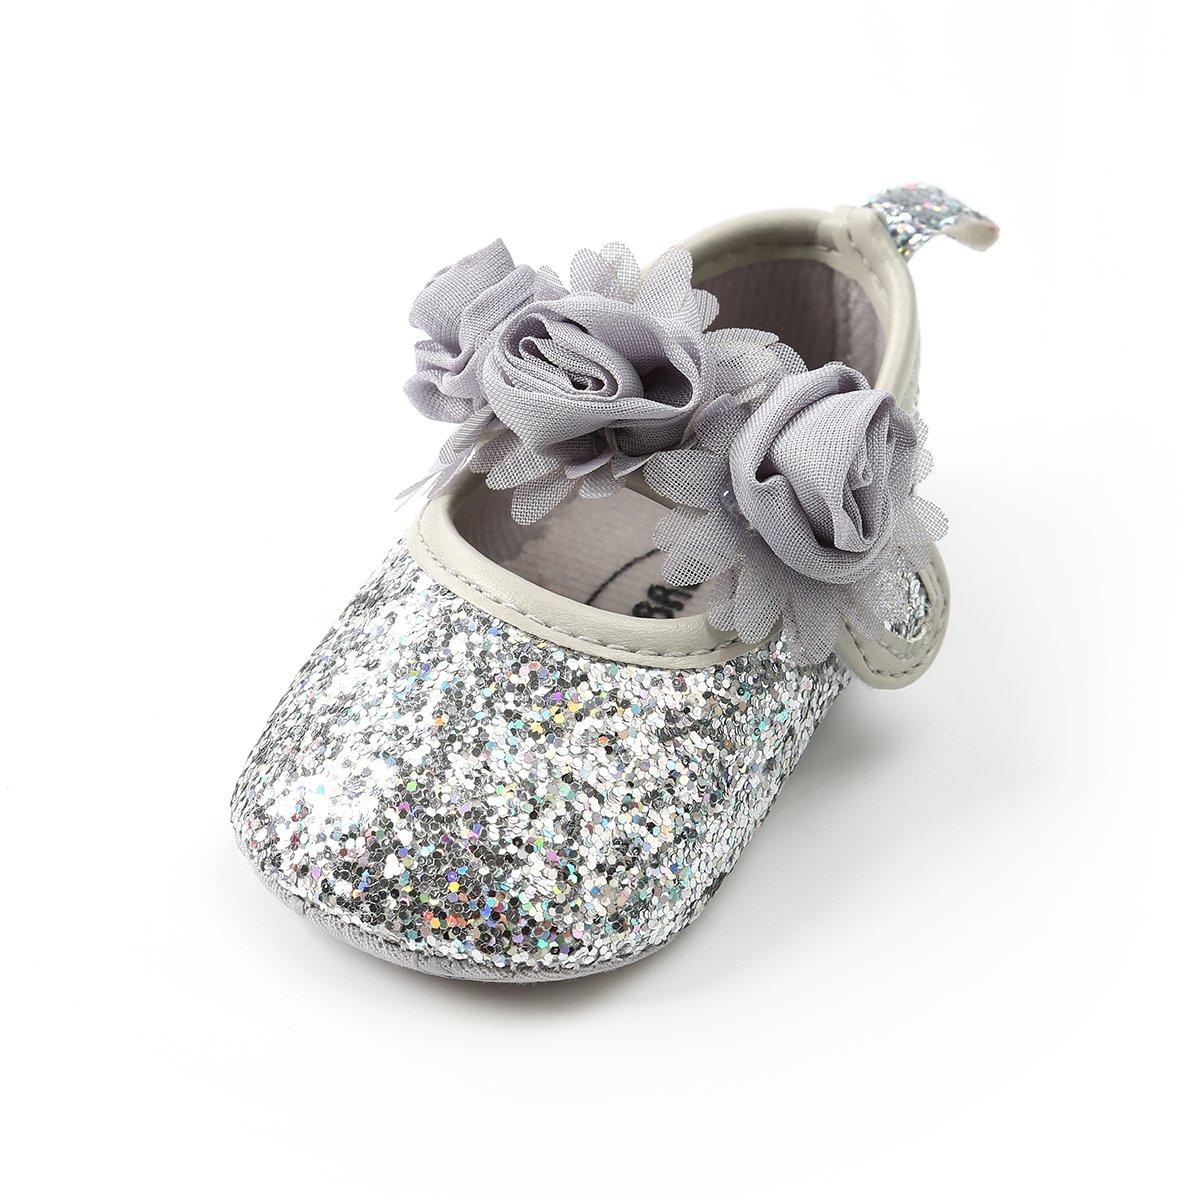 Baby Girl Moccasins Princess Sparkly Premium Lightweight Soft Sole Prewalker Toddler Shoes (L:12-18 Months, 1816-Silver)